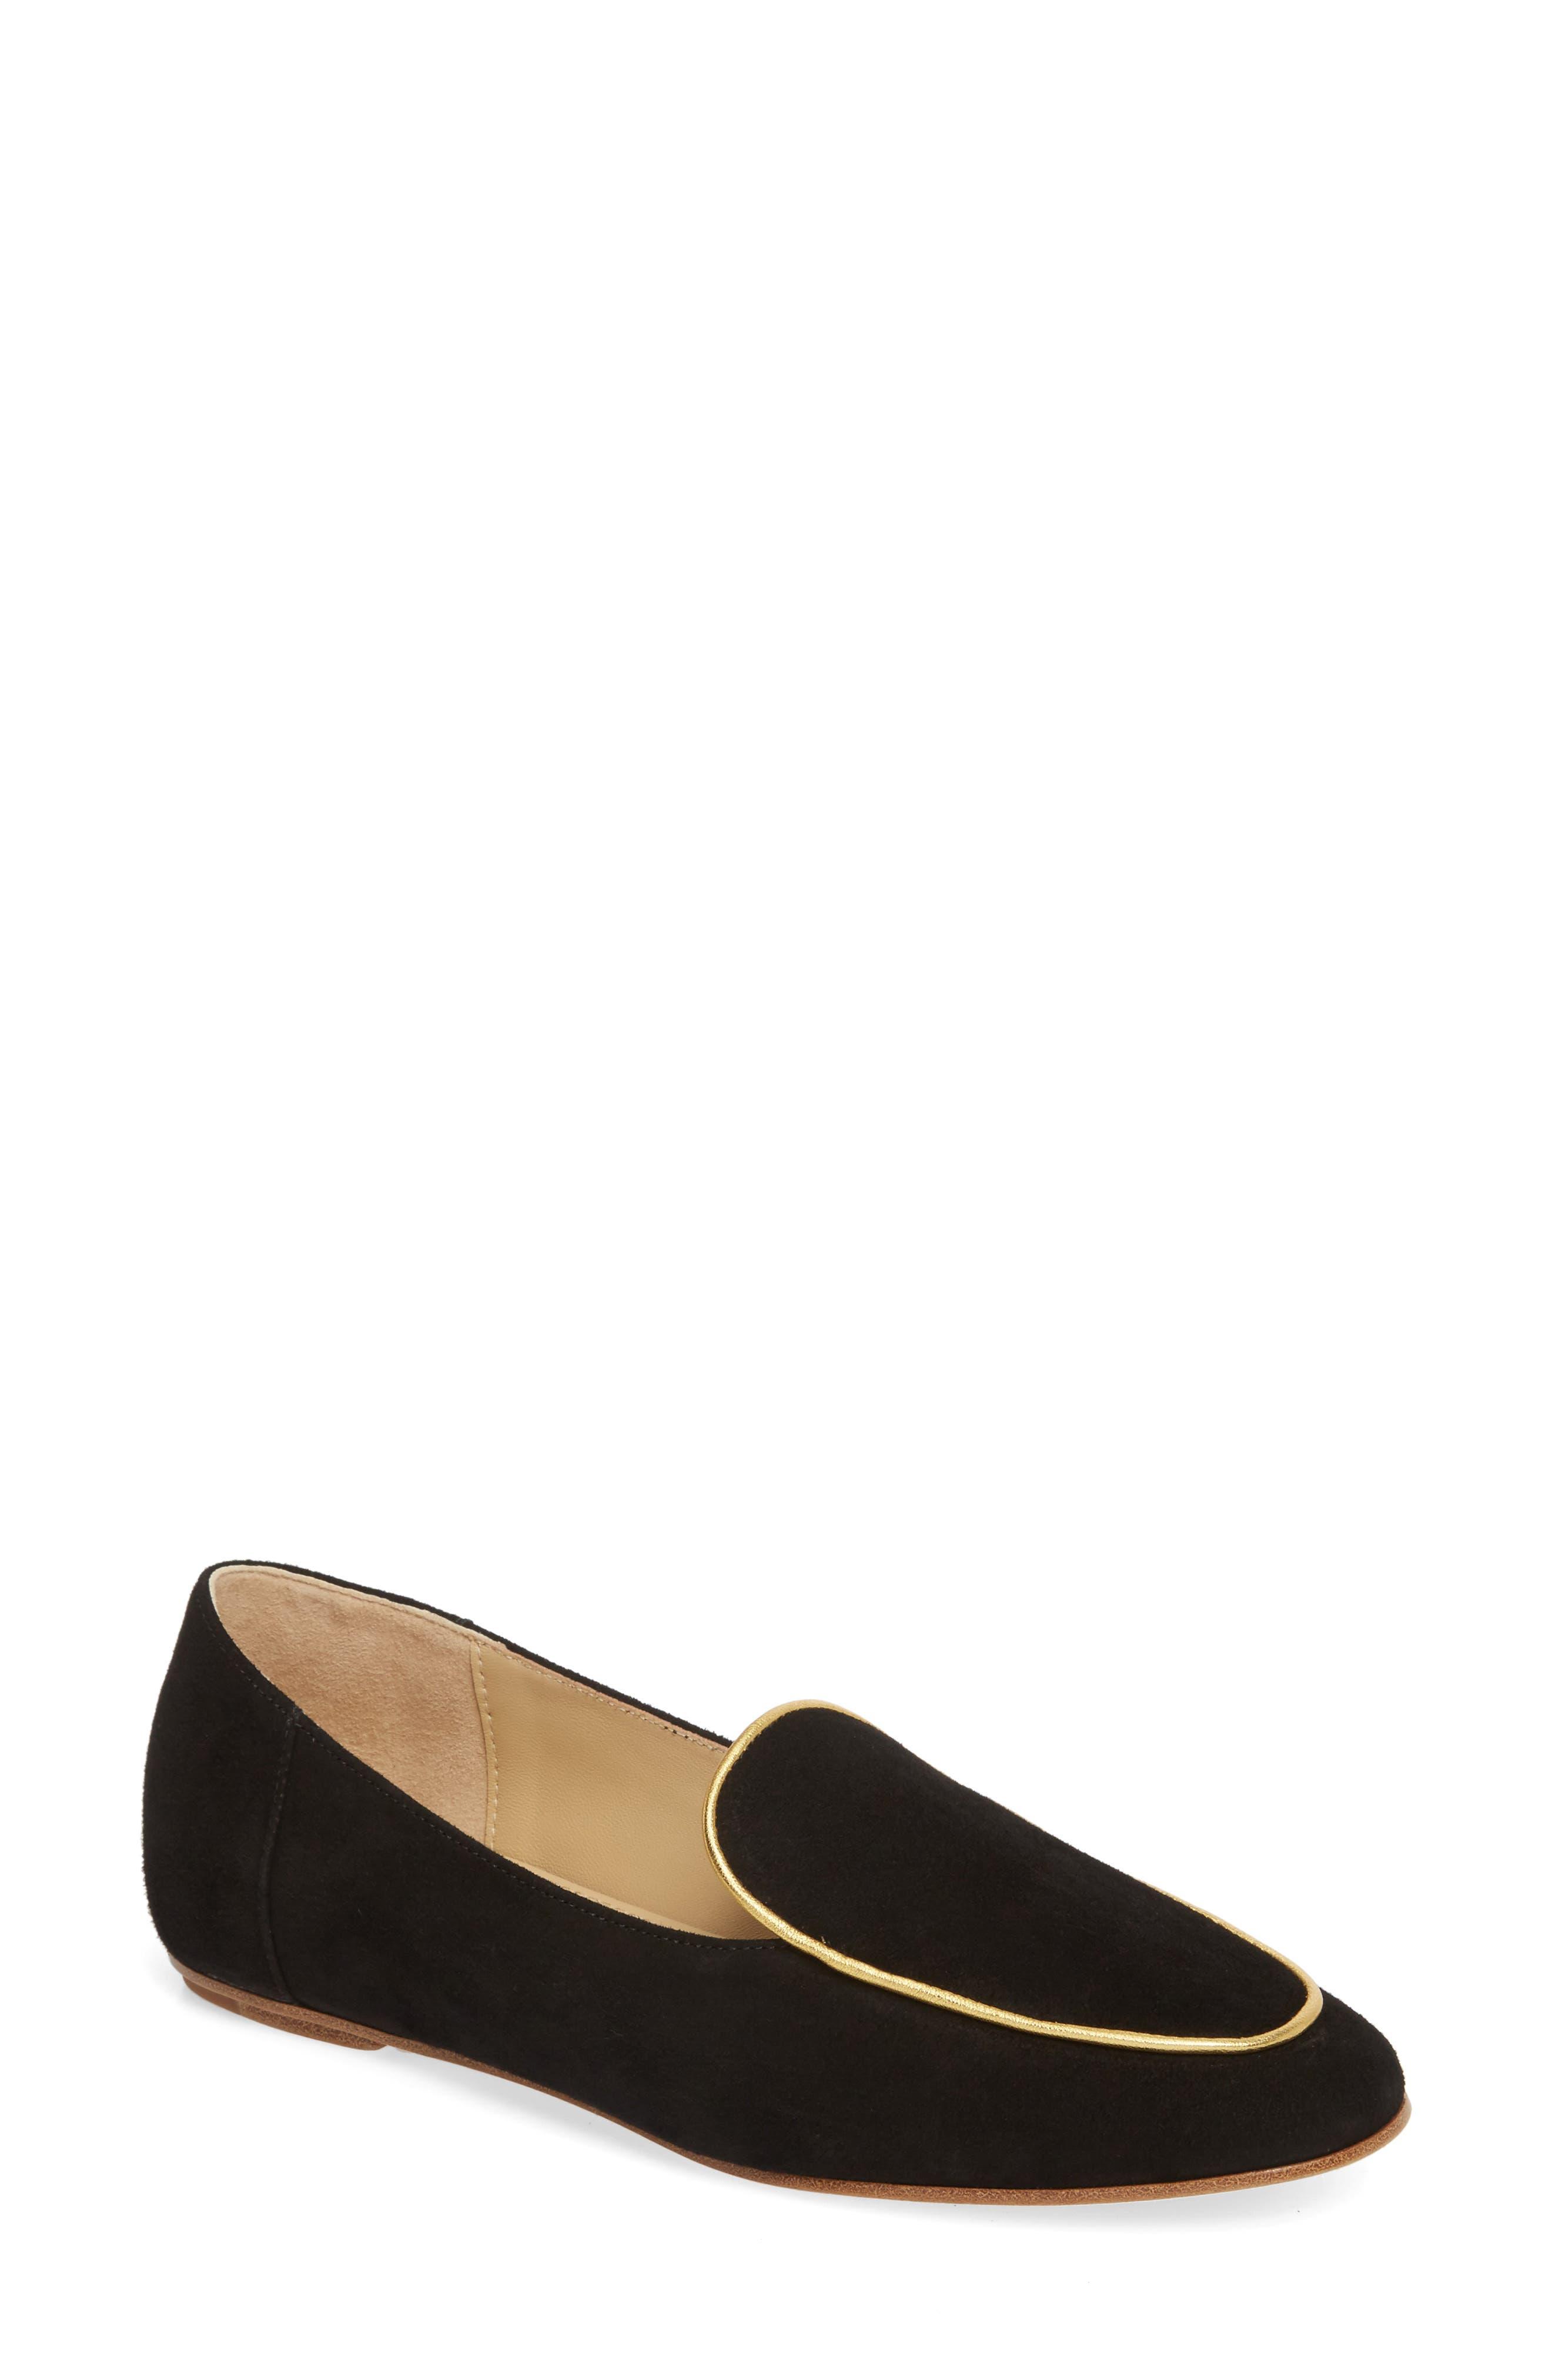 Camille Loafer,                         Main,                         color, BLACK/ GOLD SUEDE